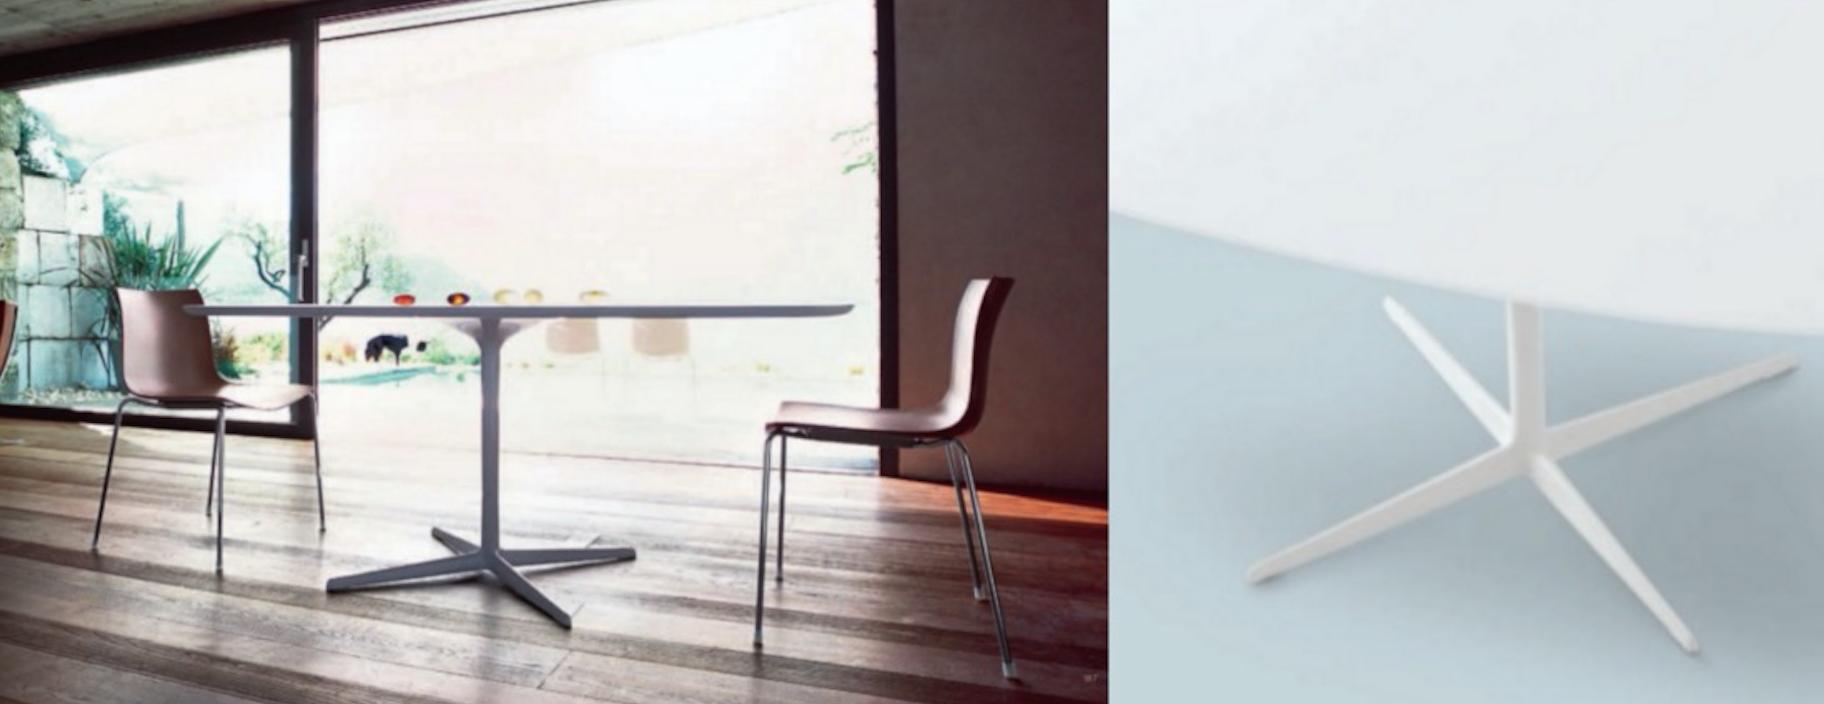 Eleo-table-detail-spaceist-furniture-range-product-of-the-week-feb